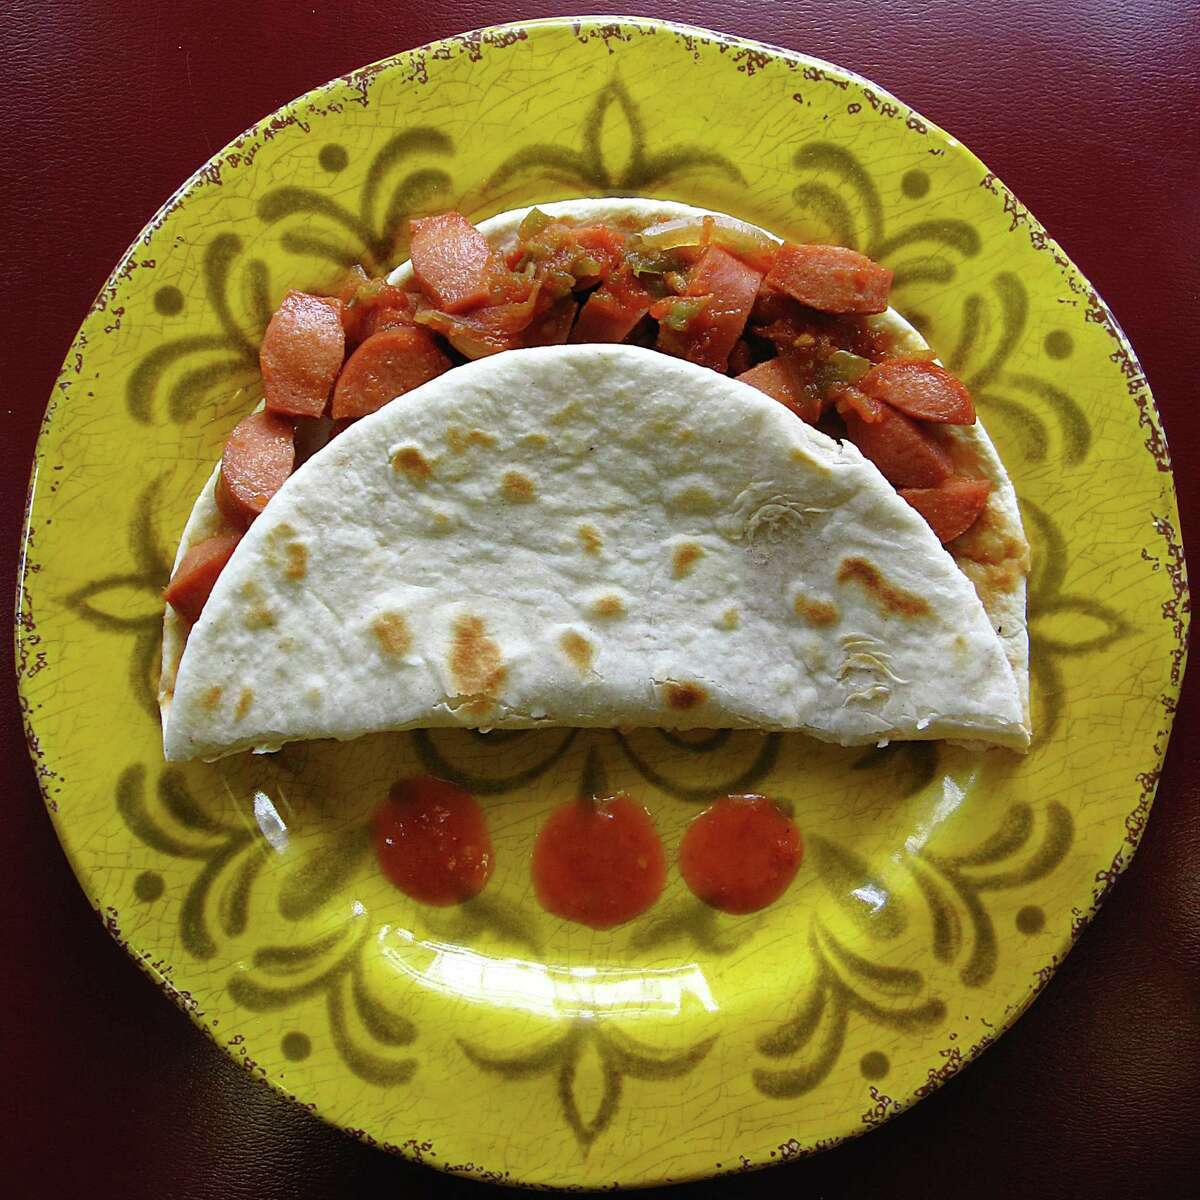 A weenies rancheras taco on a handmade flour tortilla from La Esquinita.